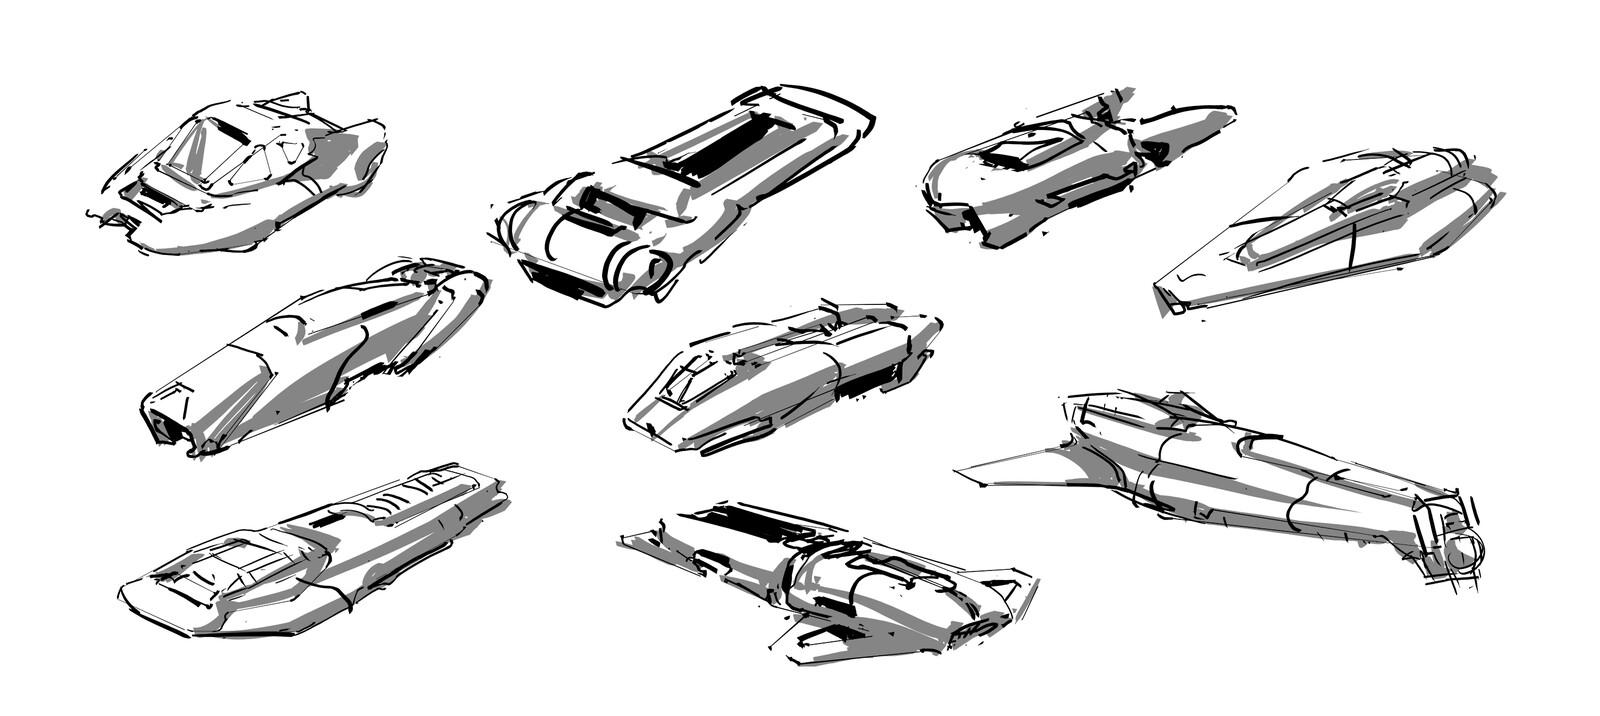 random BW lines sketches